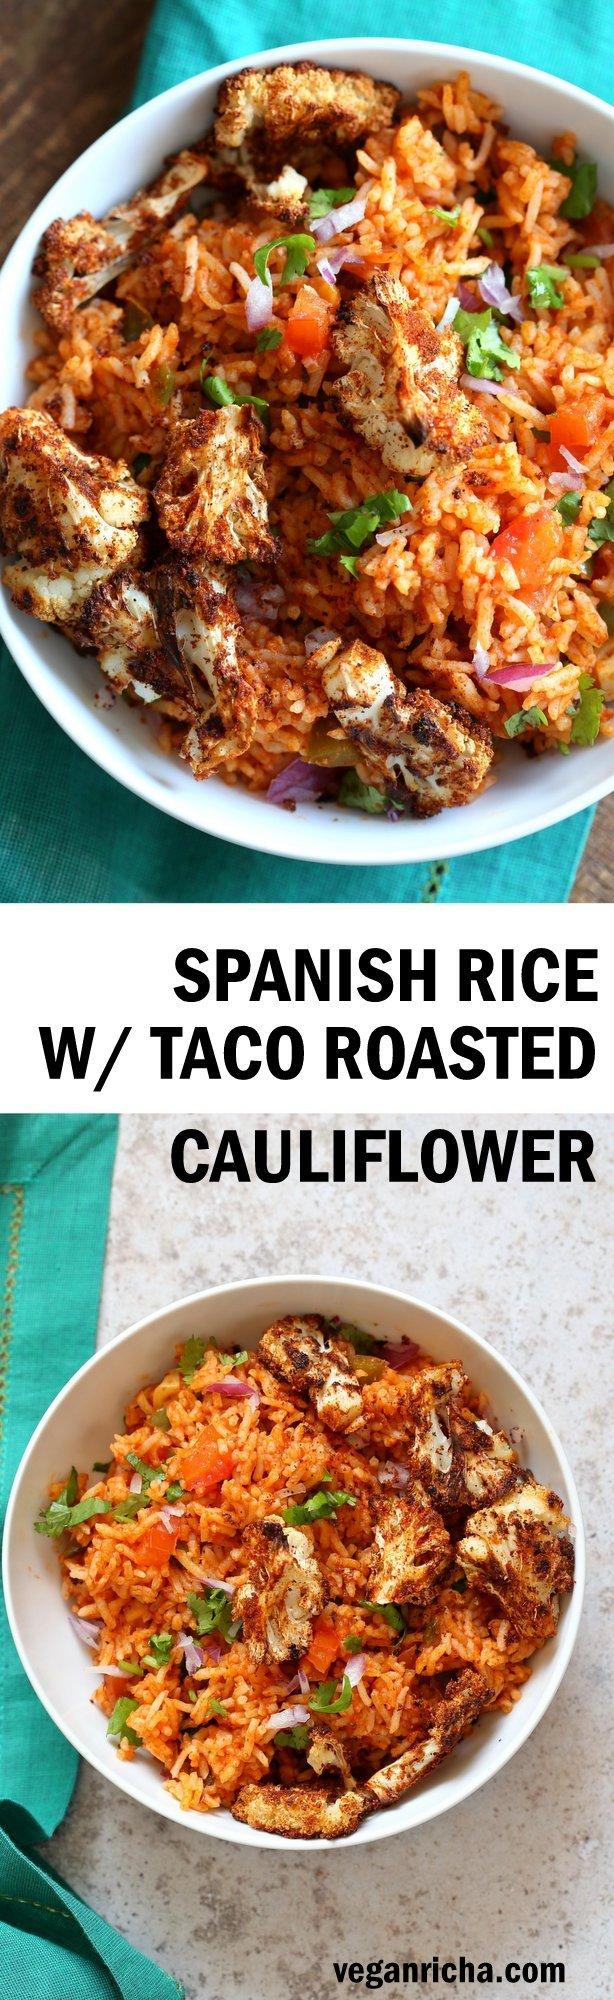 Easy Vegan Spanish Rice Bowl with Taco Roasted Cauliflower. Everyday Meal with everyday ingredients. Make into burrito. 30 Mins Easily Oilfree #veganricha #Vegan #Glutenfree #Nutfree #Soyfree #Recipe | VeganRicha.com